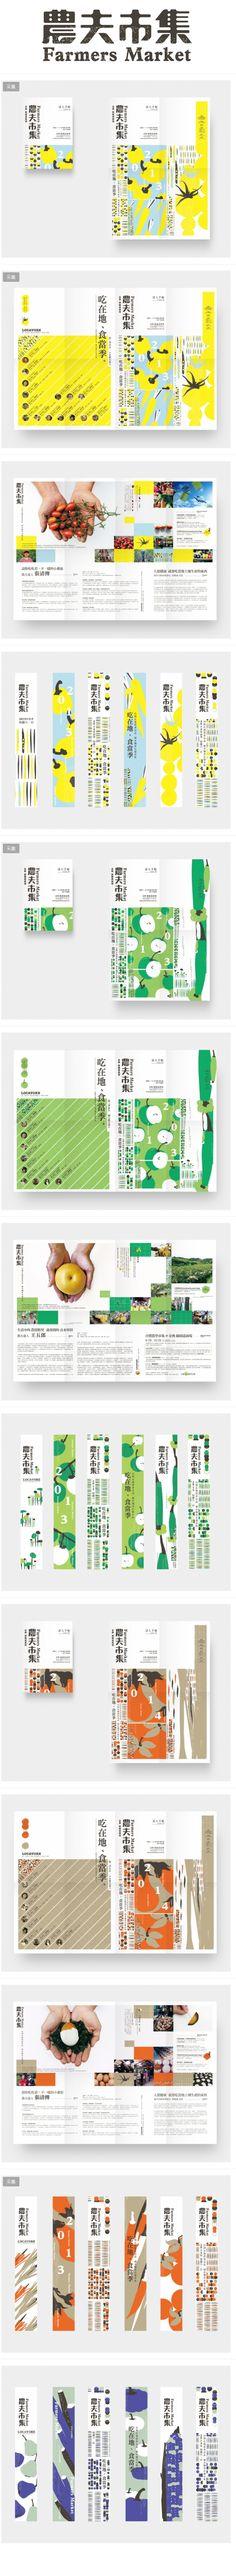 Farmers Market農夫市集品牌...@工言人俊采集到版式设计(1106图)_花瓣平面设计